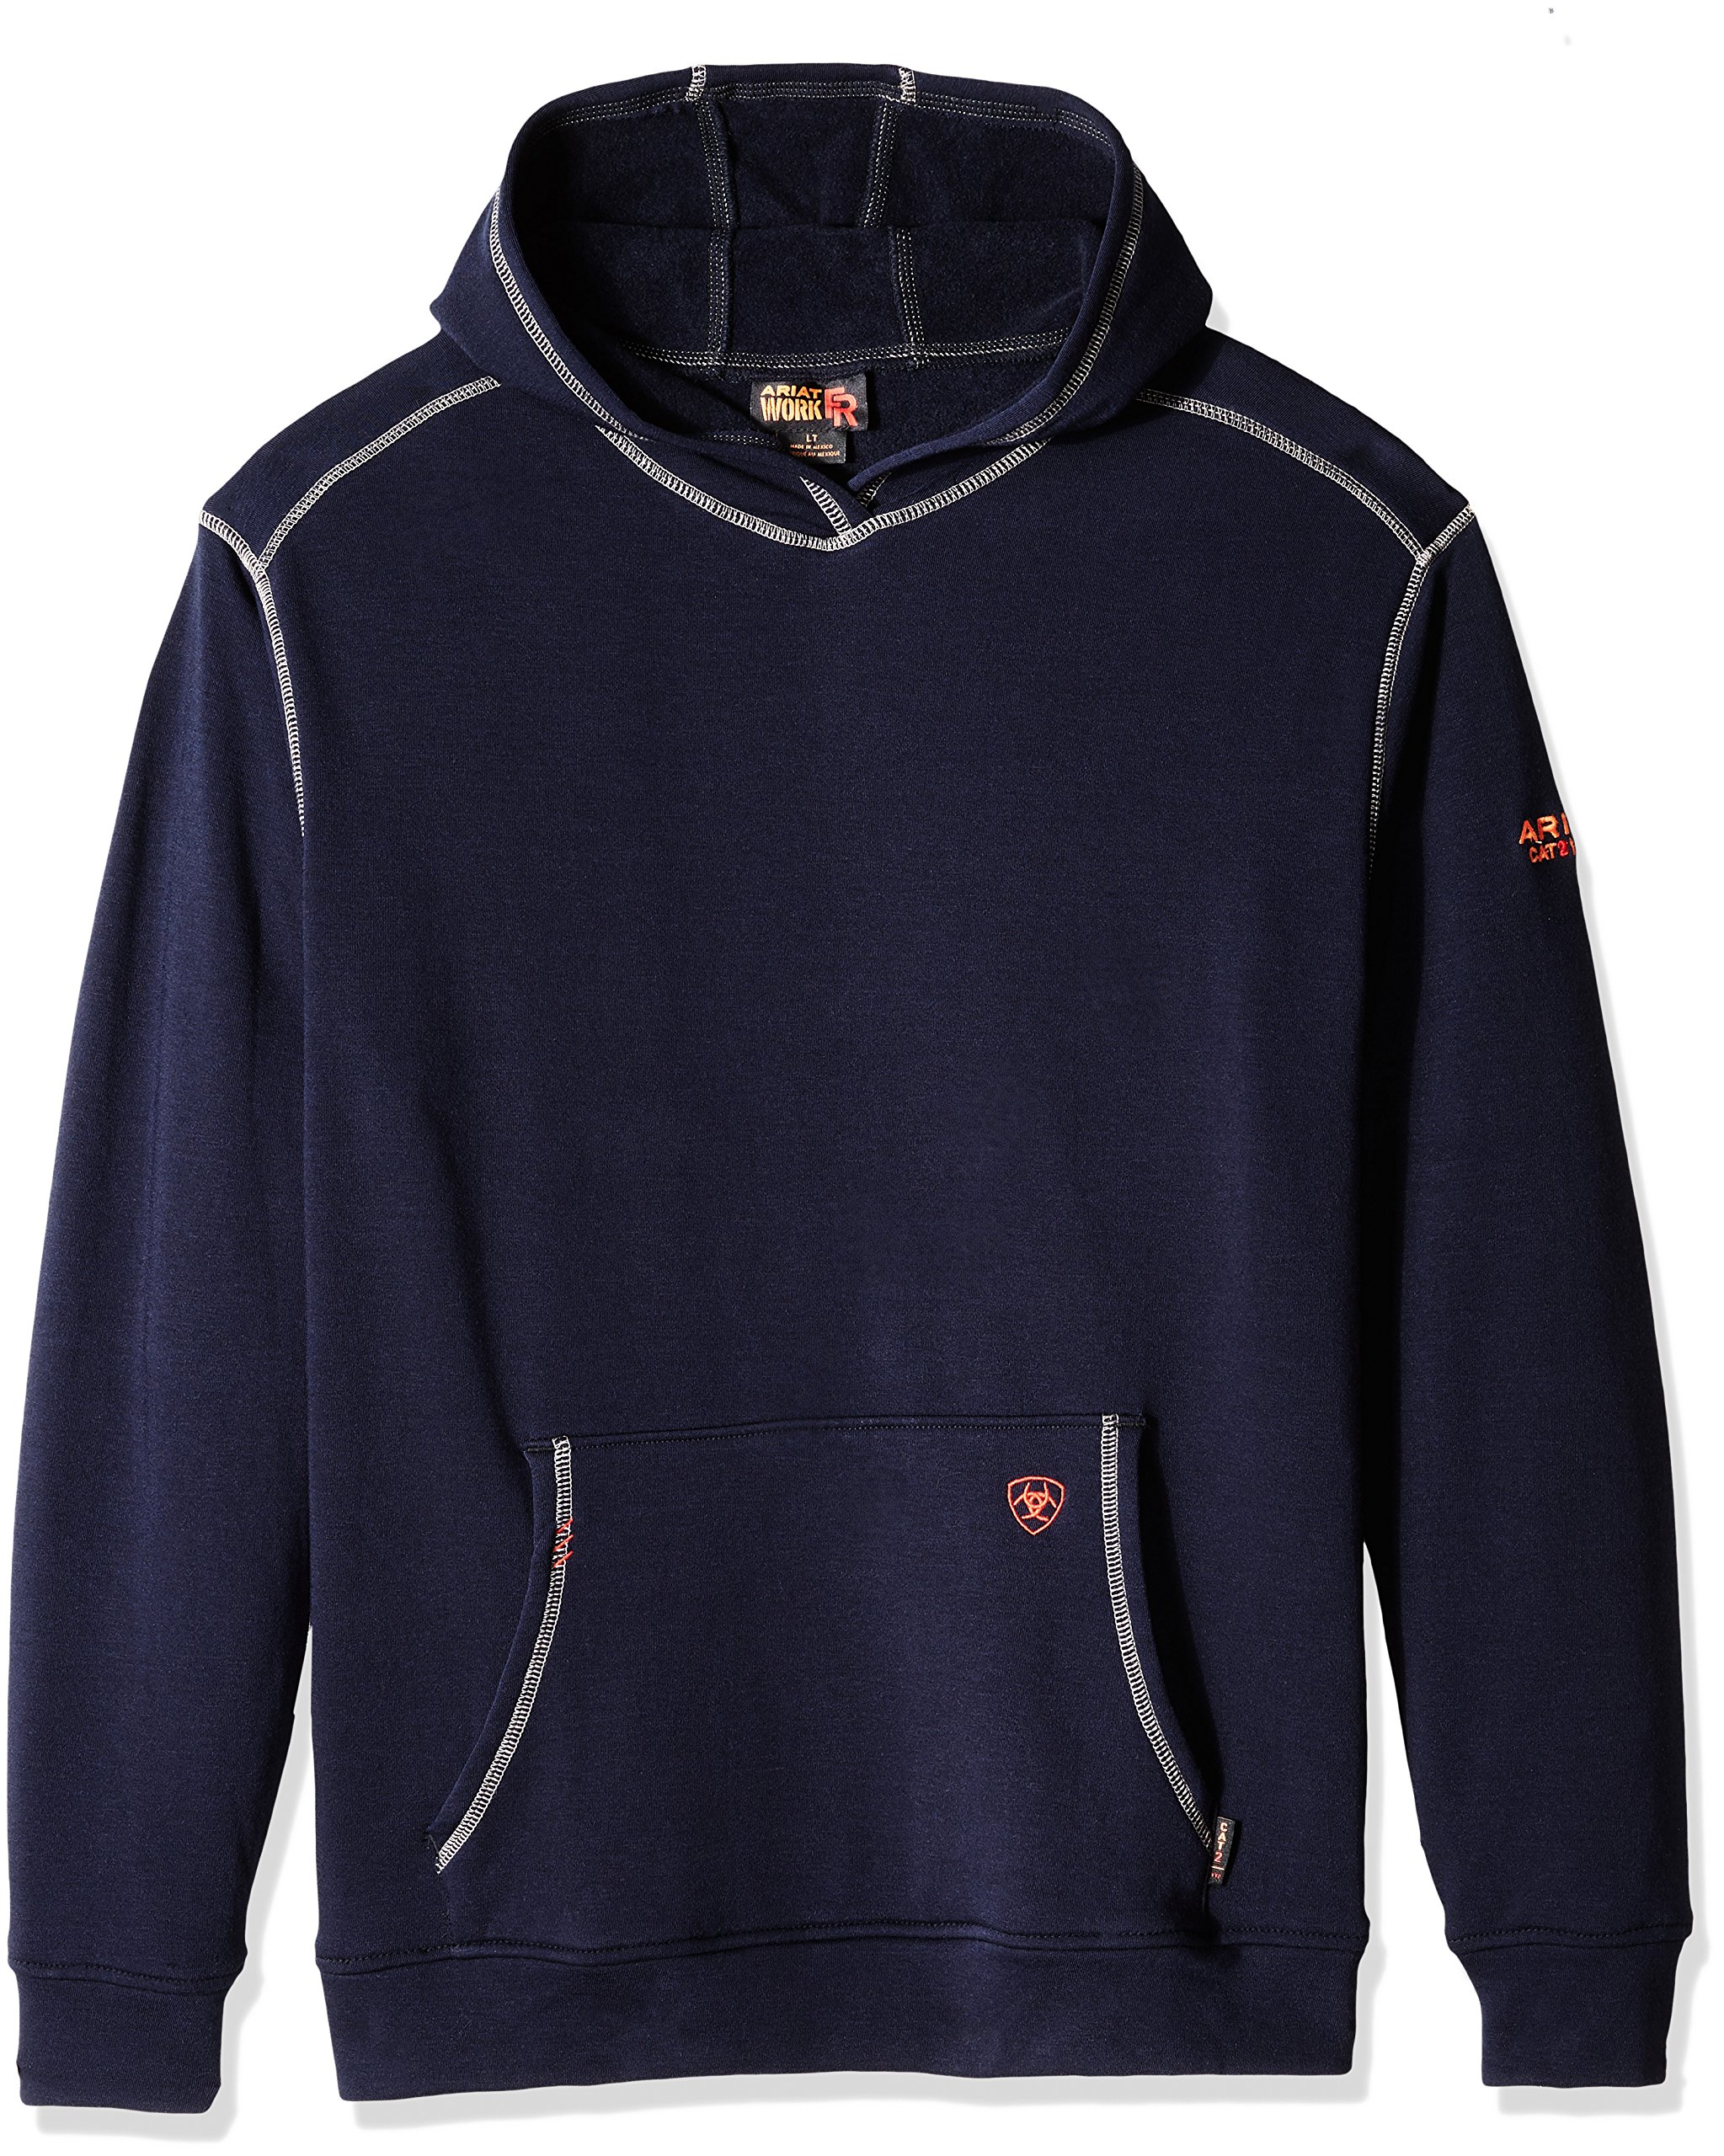 Ariat Men's Big and Tall Flame Resistant Polartec HoodieShirt, Coffee Bean Multi, Large